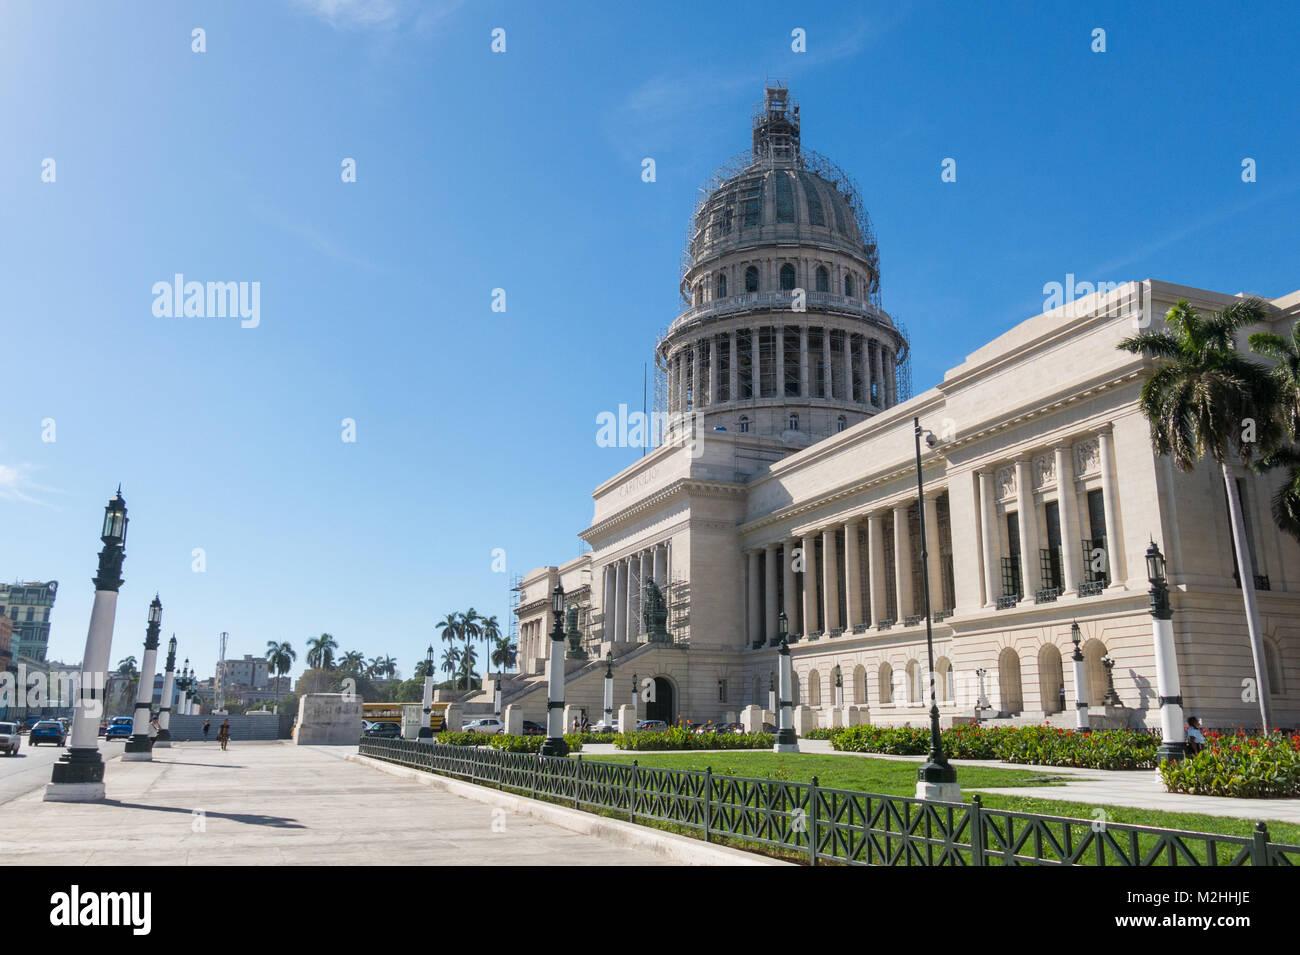 HAVANA, CUBA - JANUARY 16, 2017: Famous National Capitol (Capitolio Nacional) building. The National Capitol Building Stock Photo